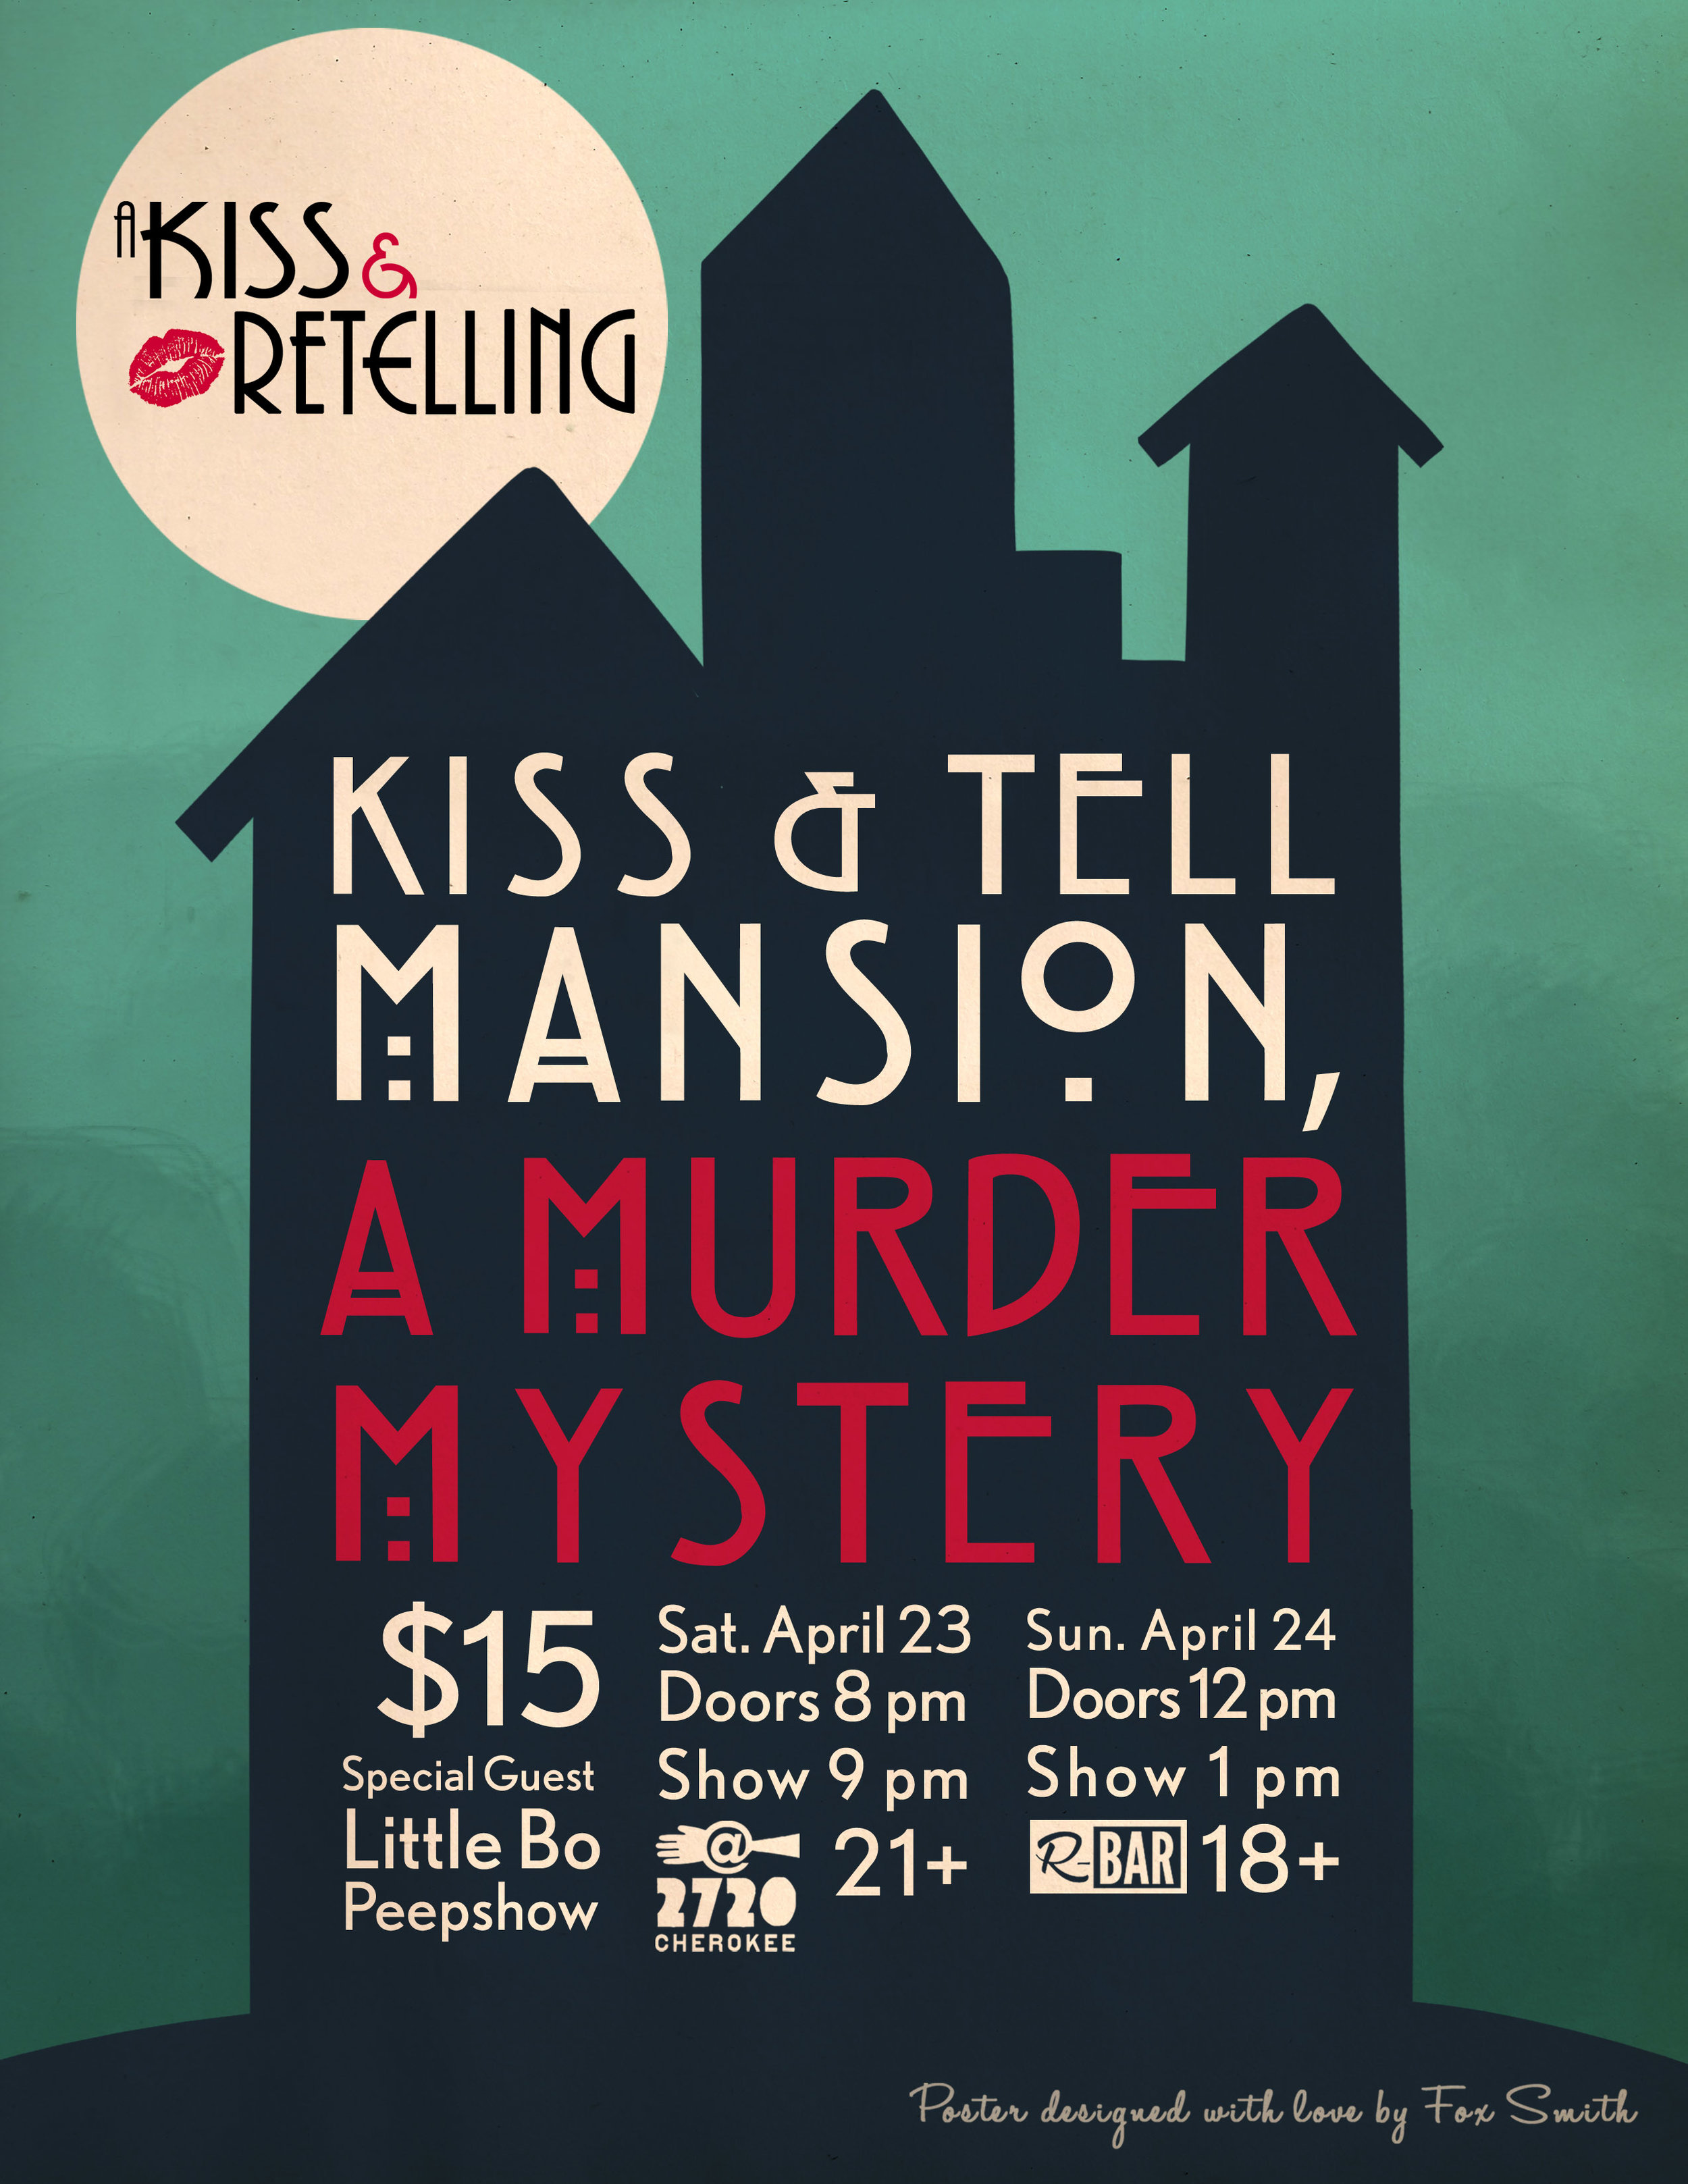 Mansion Mystery Flyer Letter Size 4.5.16c.jpg